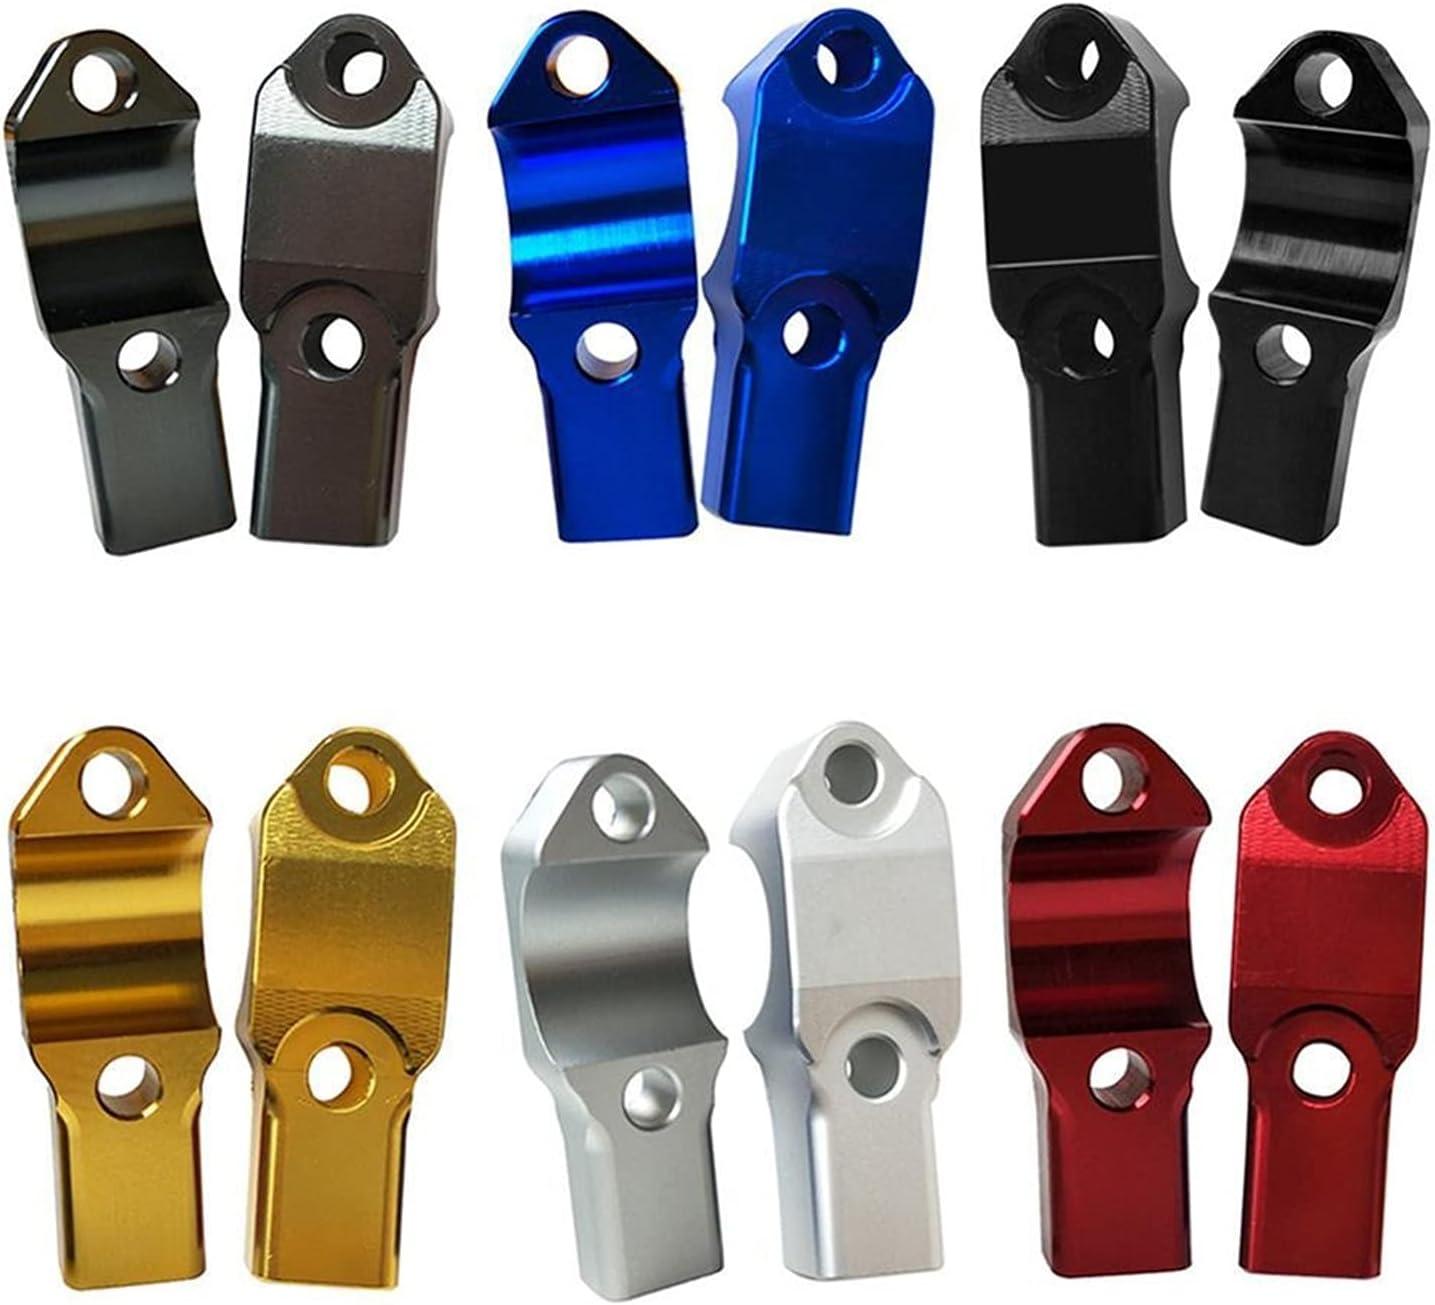 KKKKKK 1PC Universal Aluminum excellence Alloy Mirror Rearview E Ranking TOP7 Motorcycle